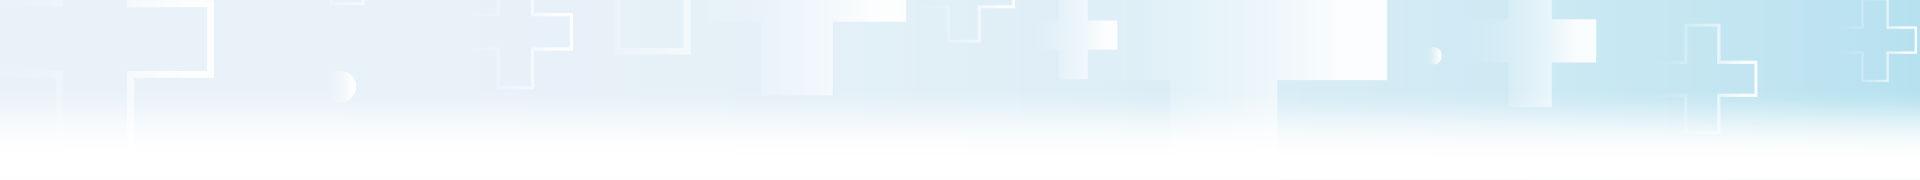 organismo-vigilanza-dispositivi-medici-meglio-in-salute-180px